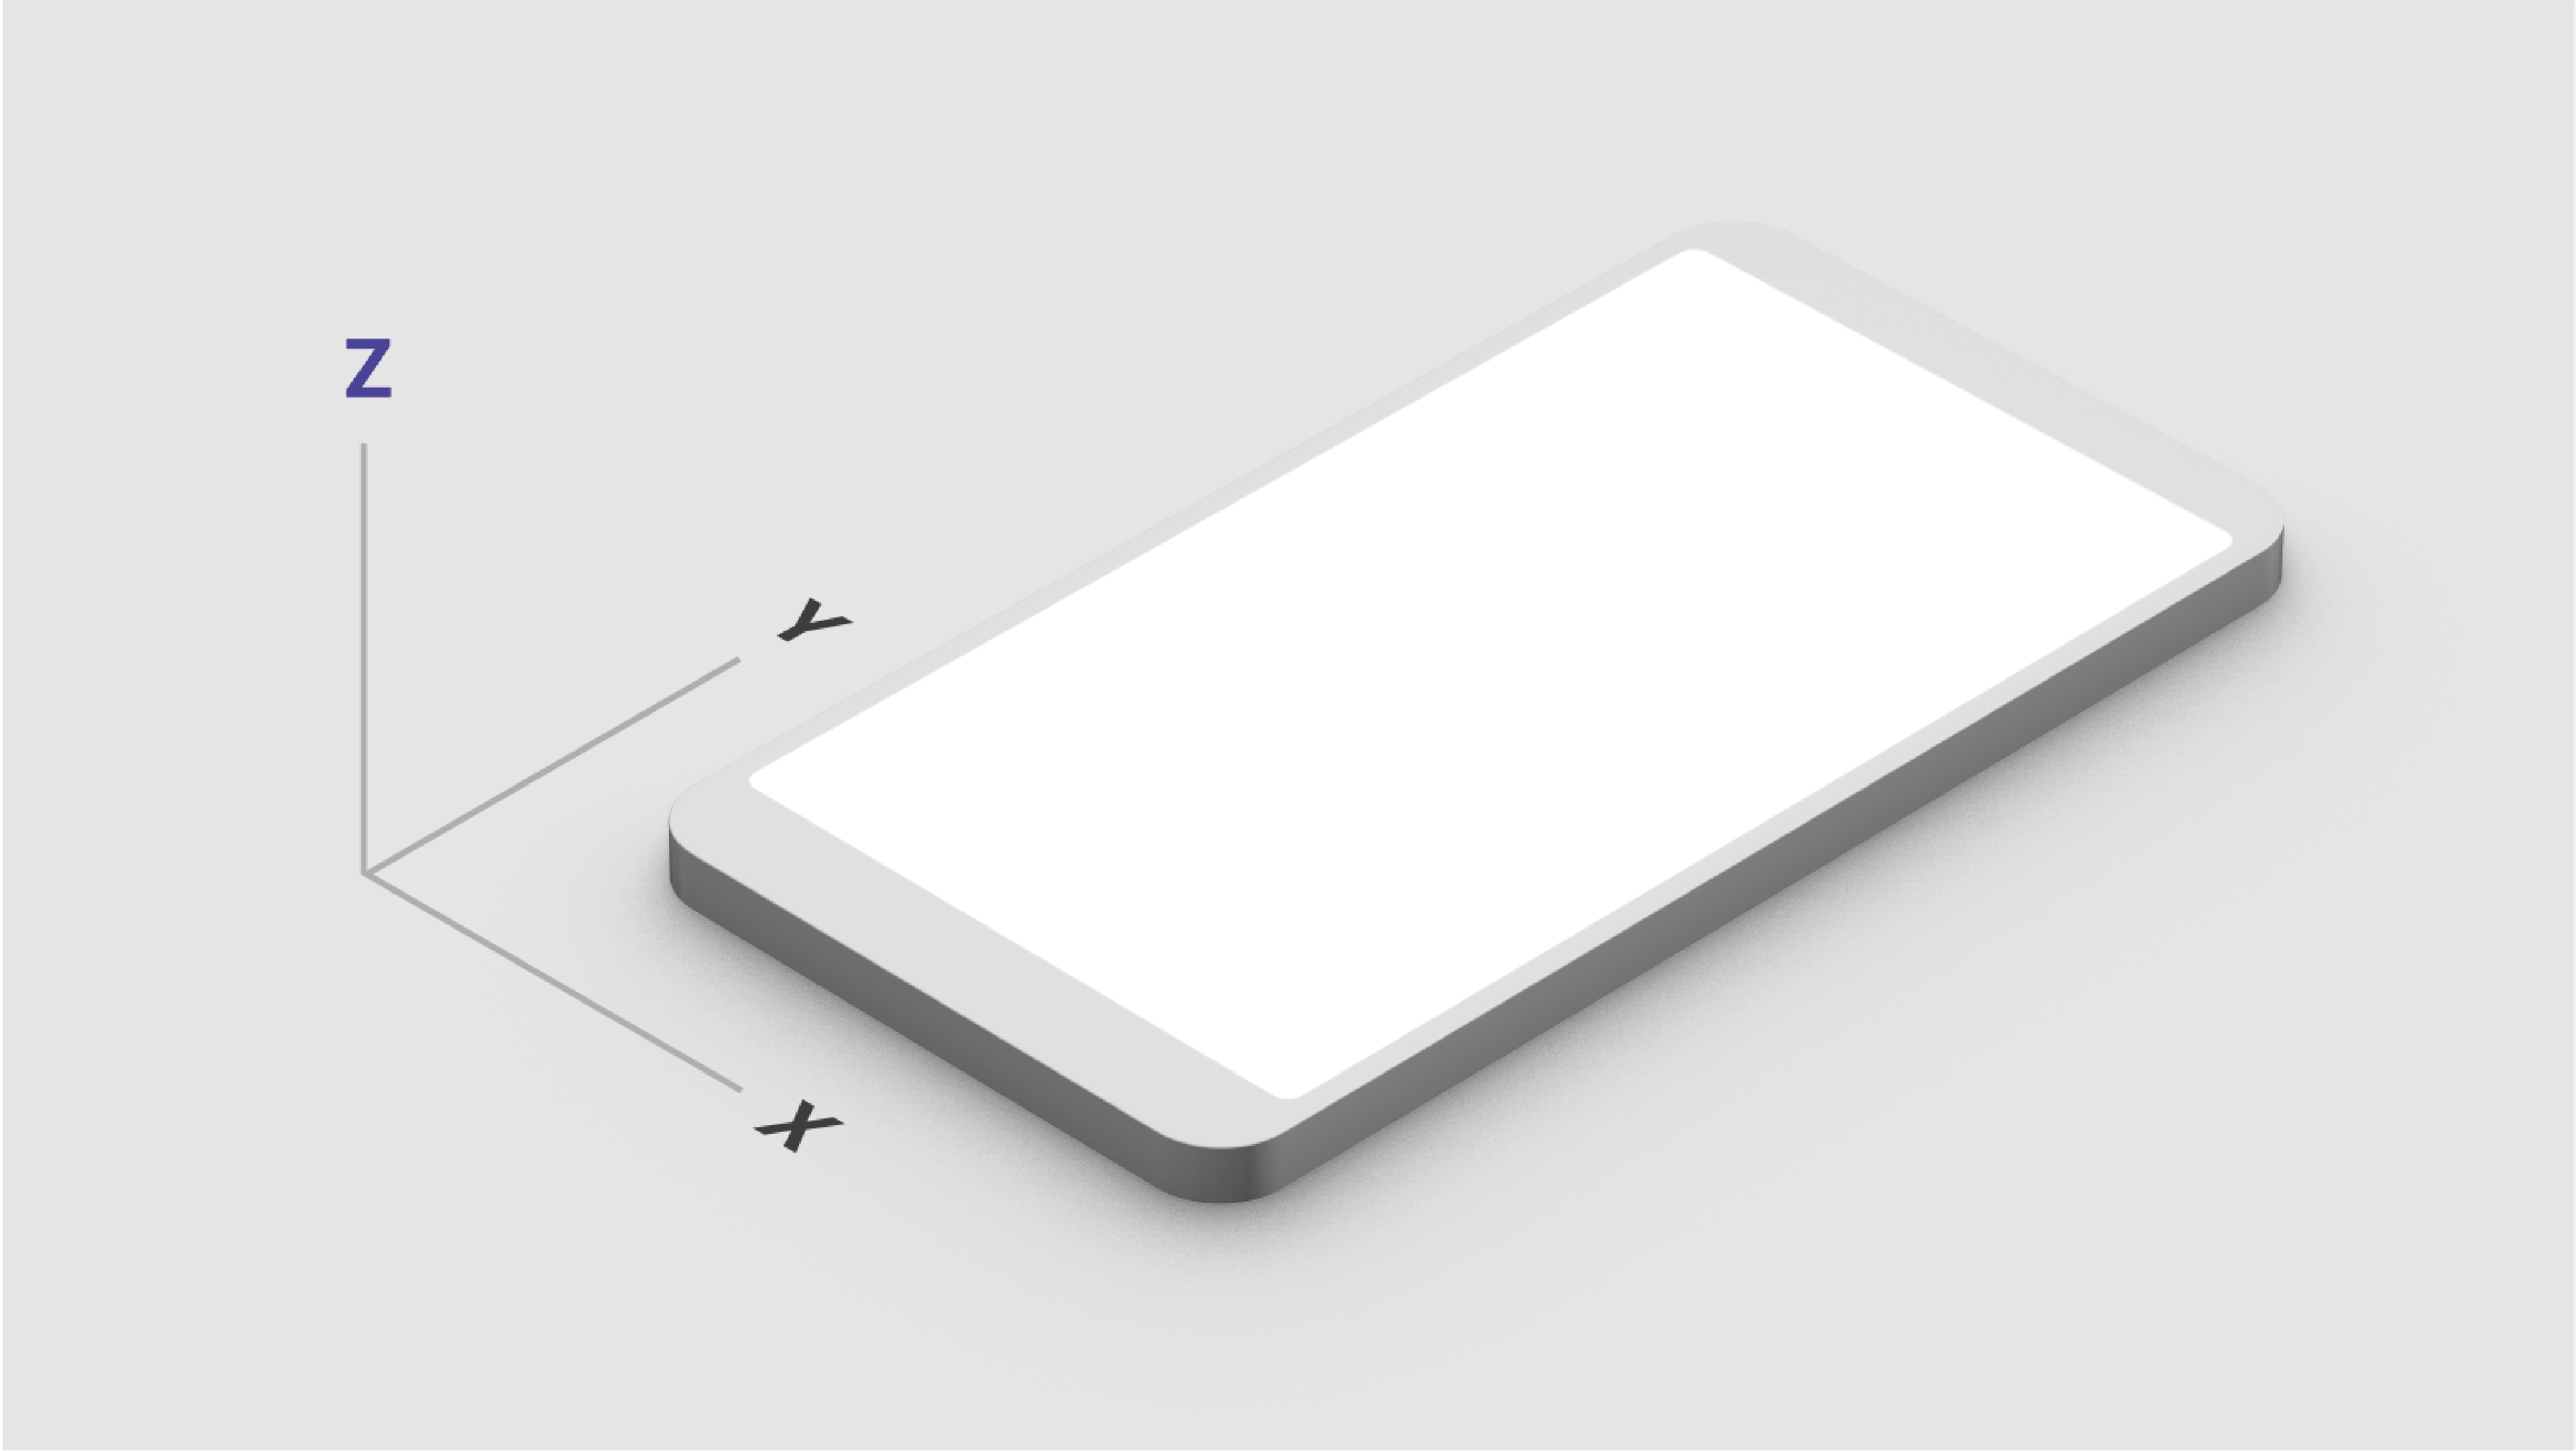 Infografik userinterfacedesign Designsystem 01 Raum